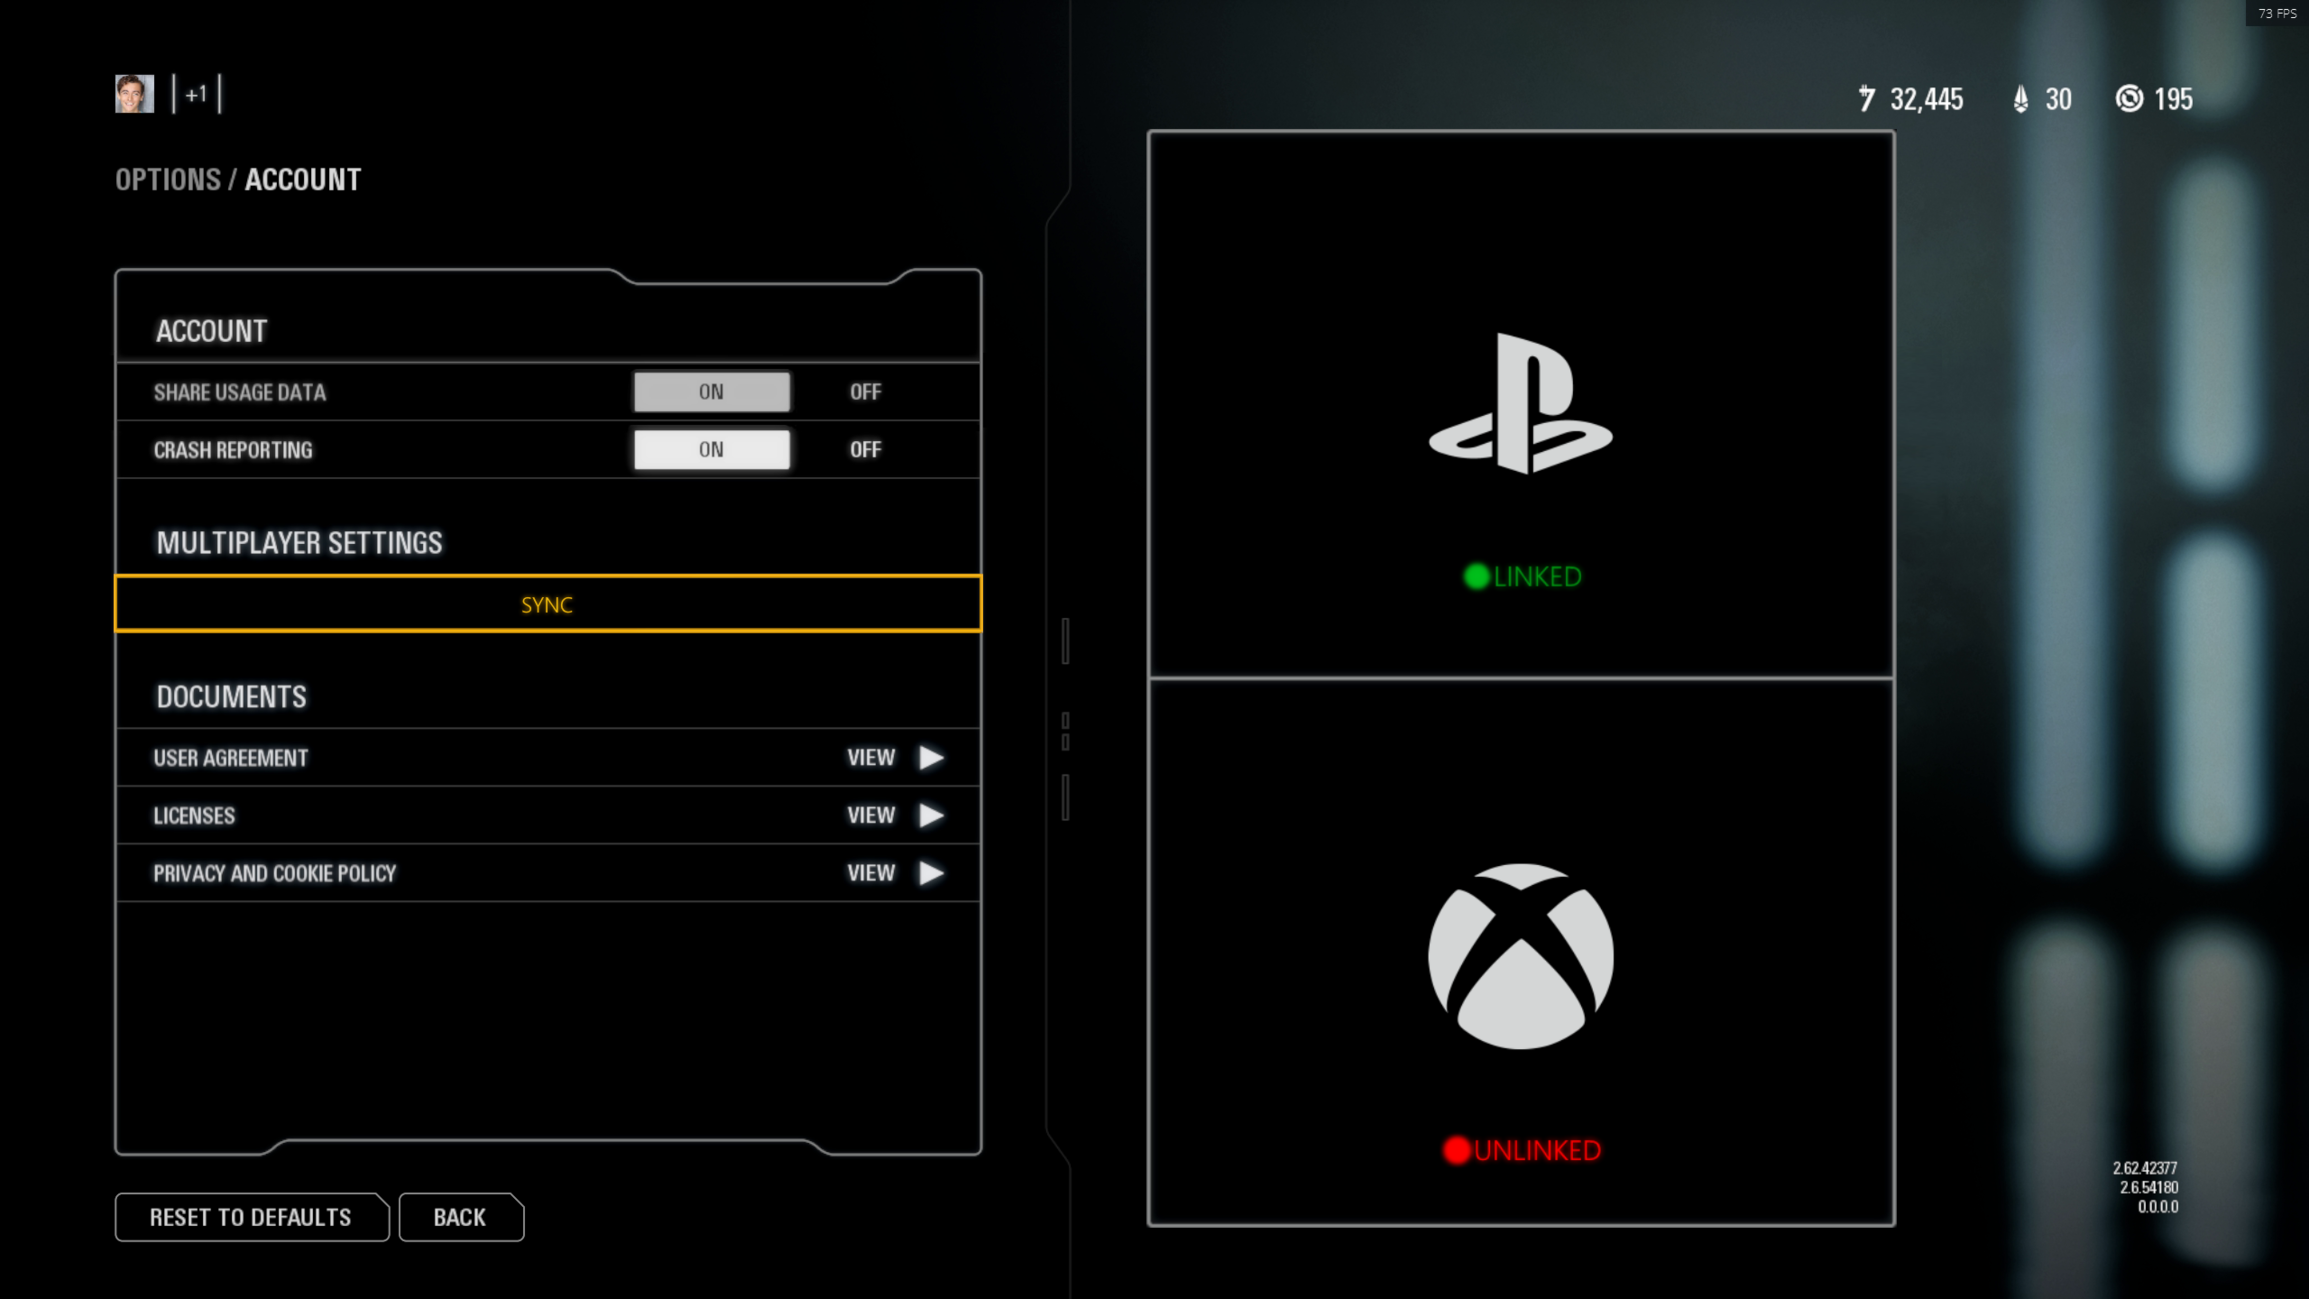 Suggestion Cross Platform Progress Star Wars Battlefront Crossover Cable Wiring Diagram For Xbox Ekami8vjqp4c